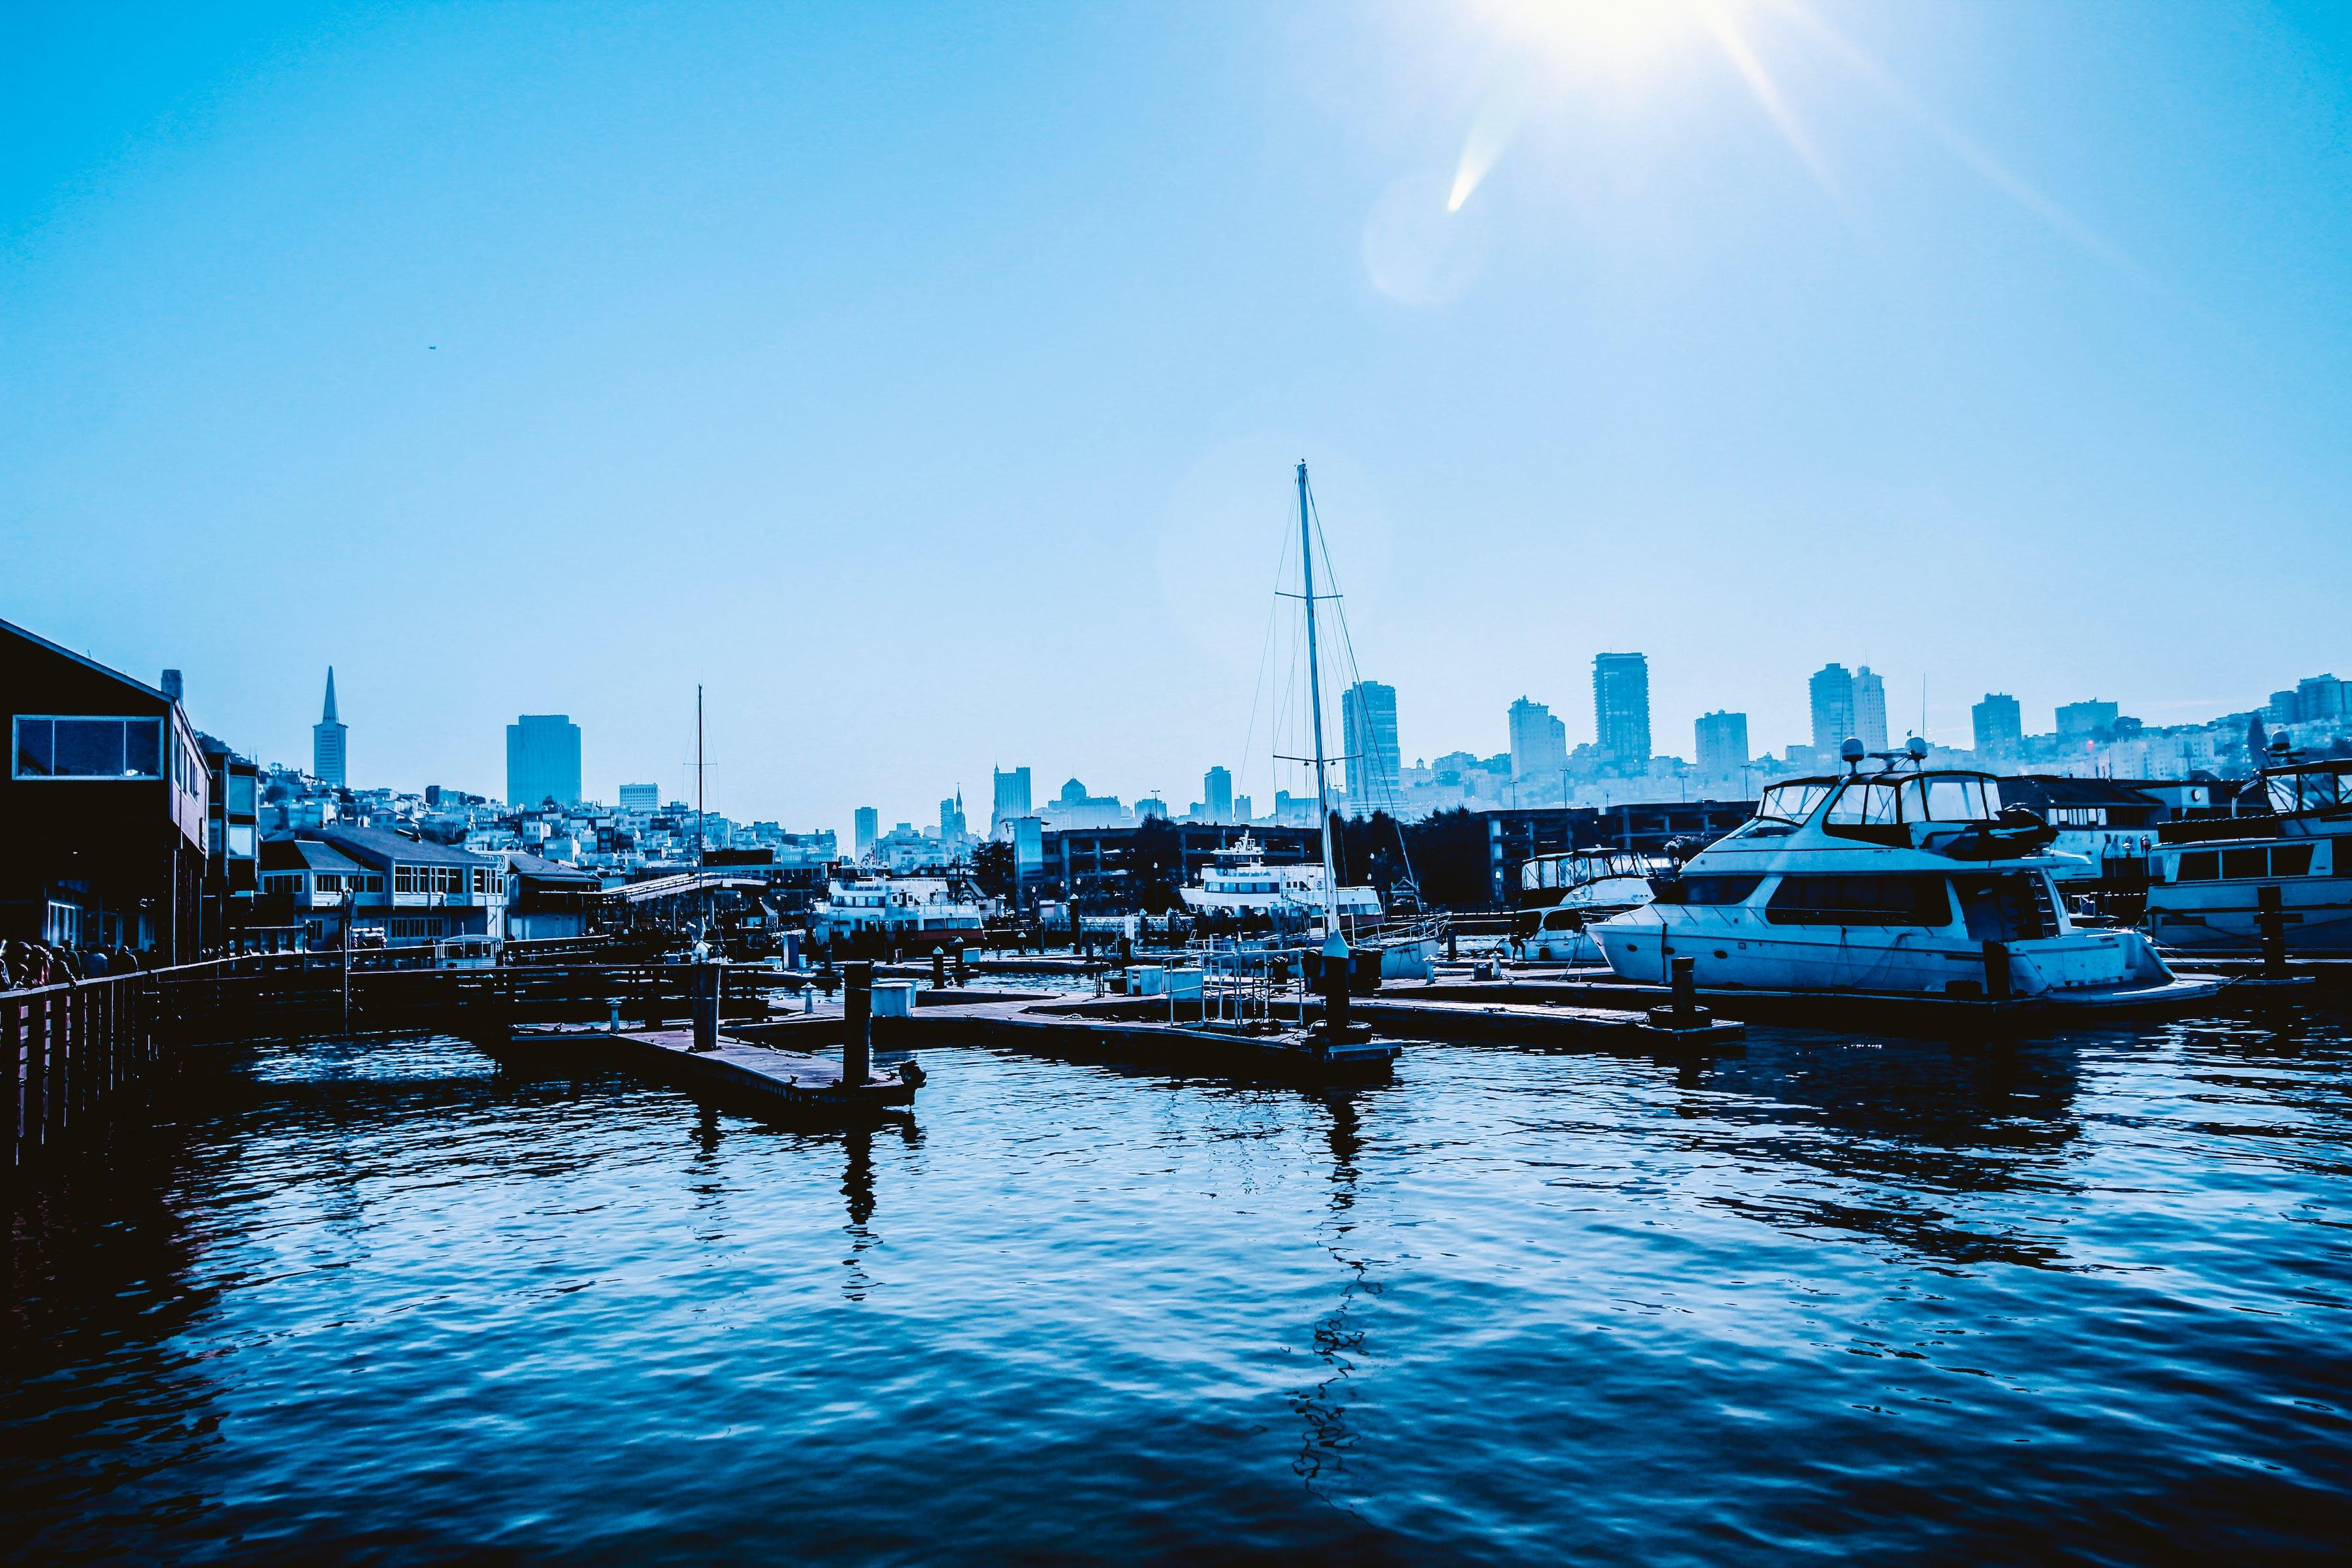 Free stock photo of boats, pier 39, sail, san francisco